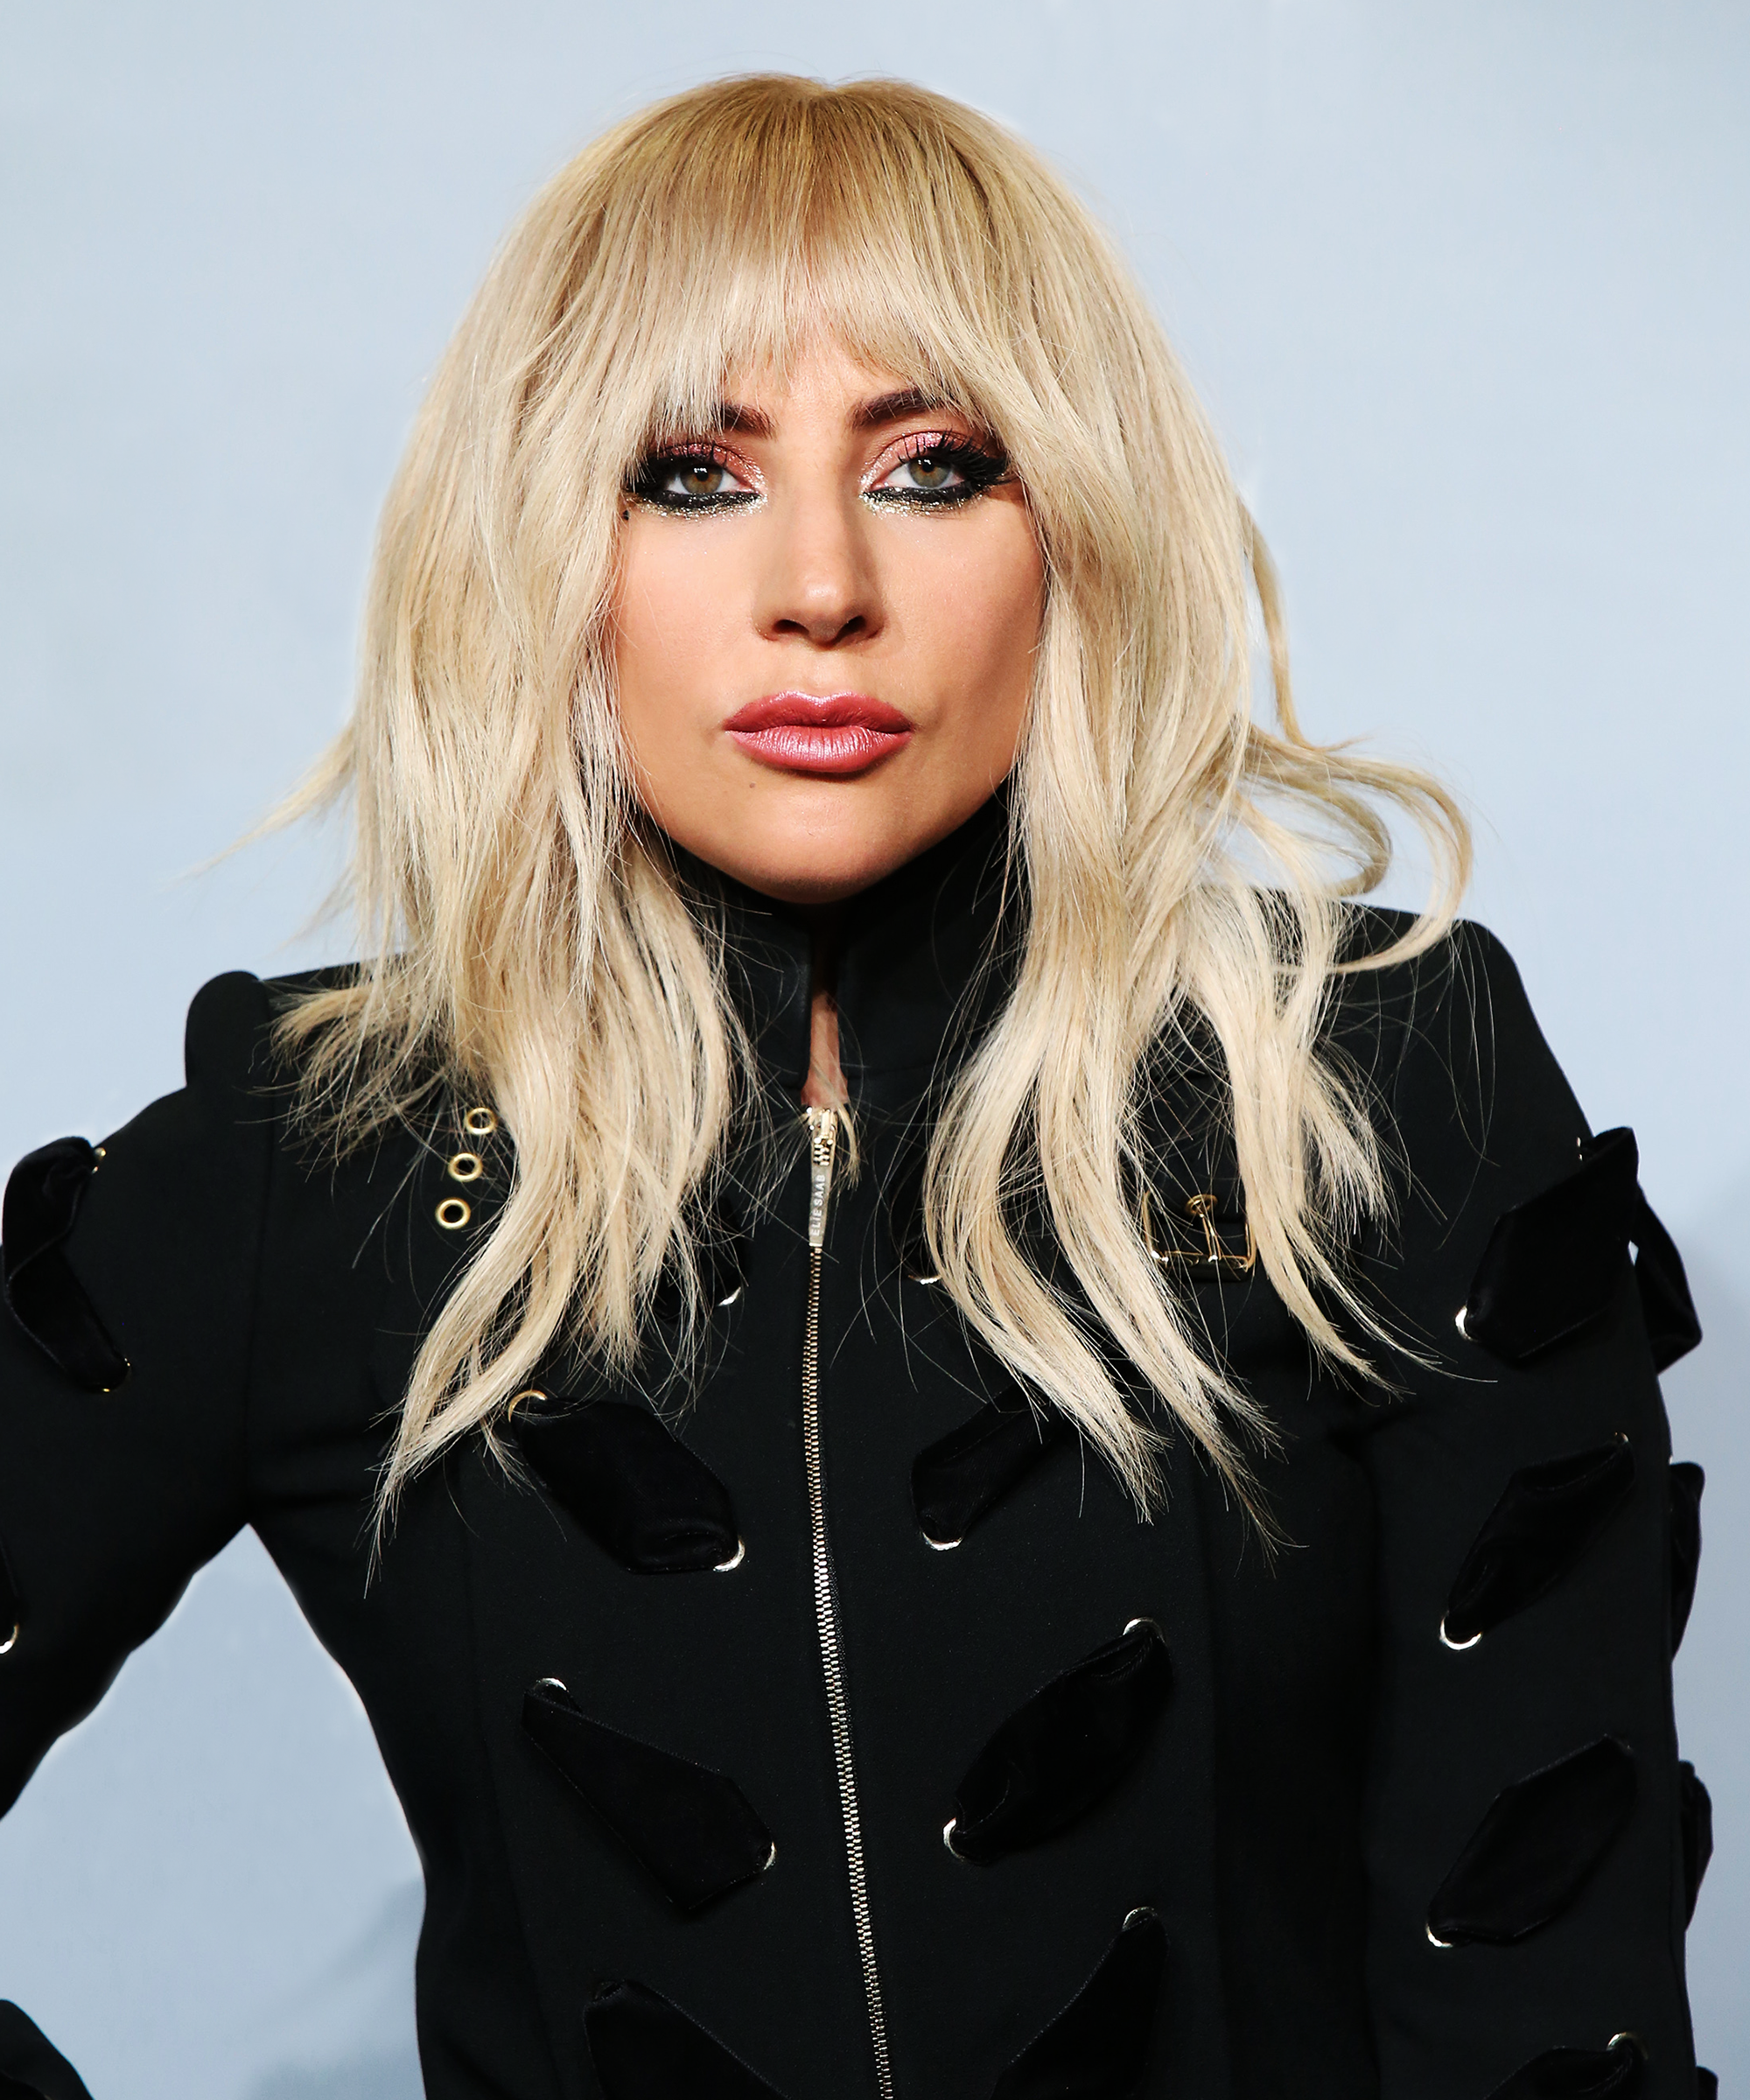 Lady Gaga Letter Apology World Tour Postponed Details